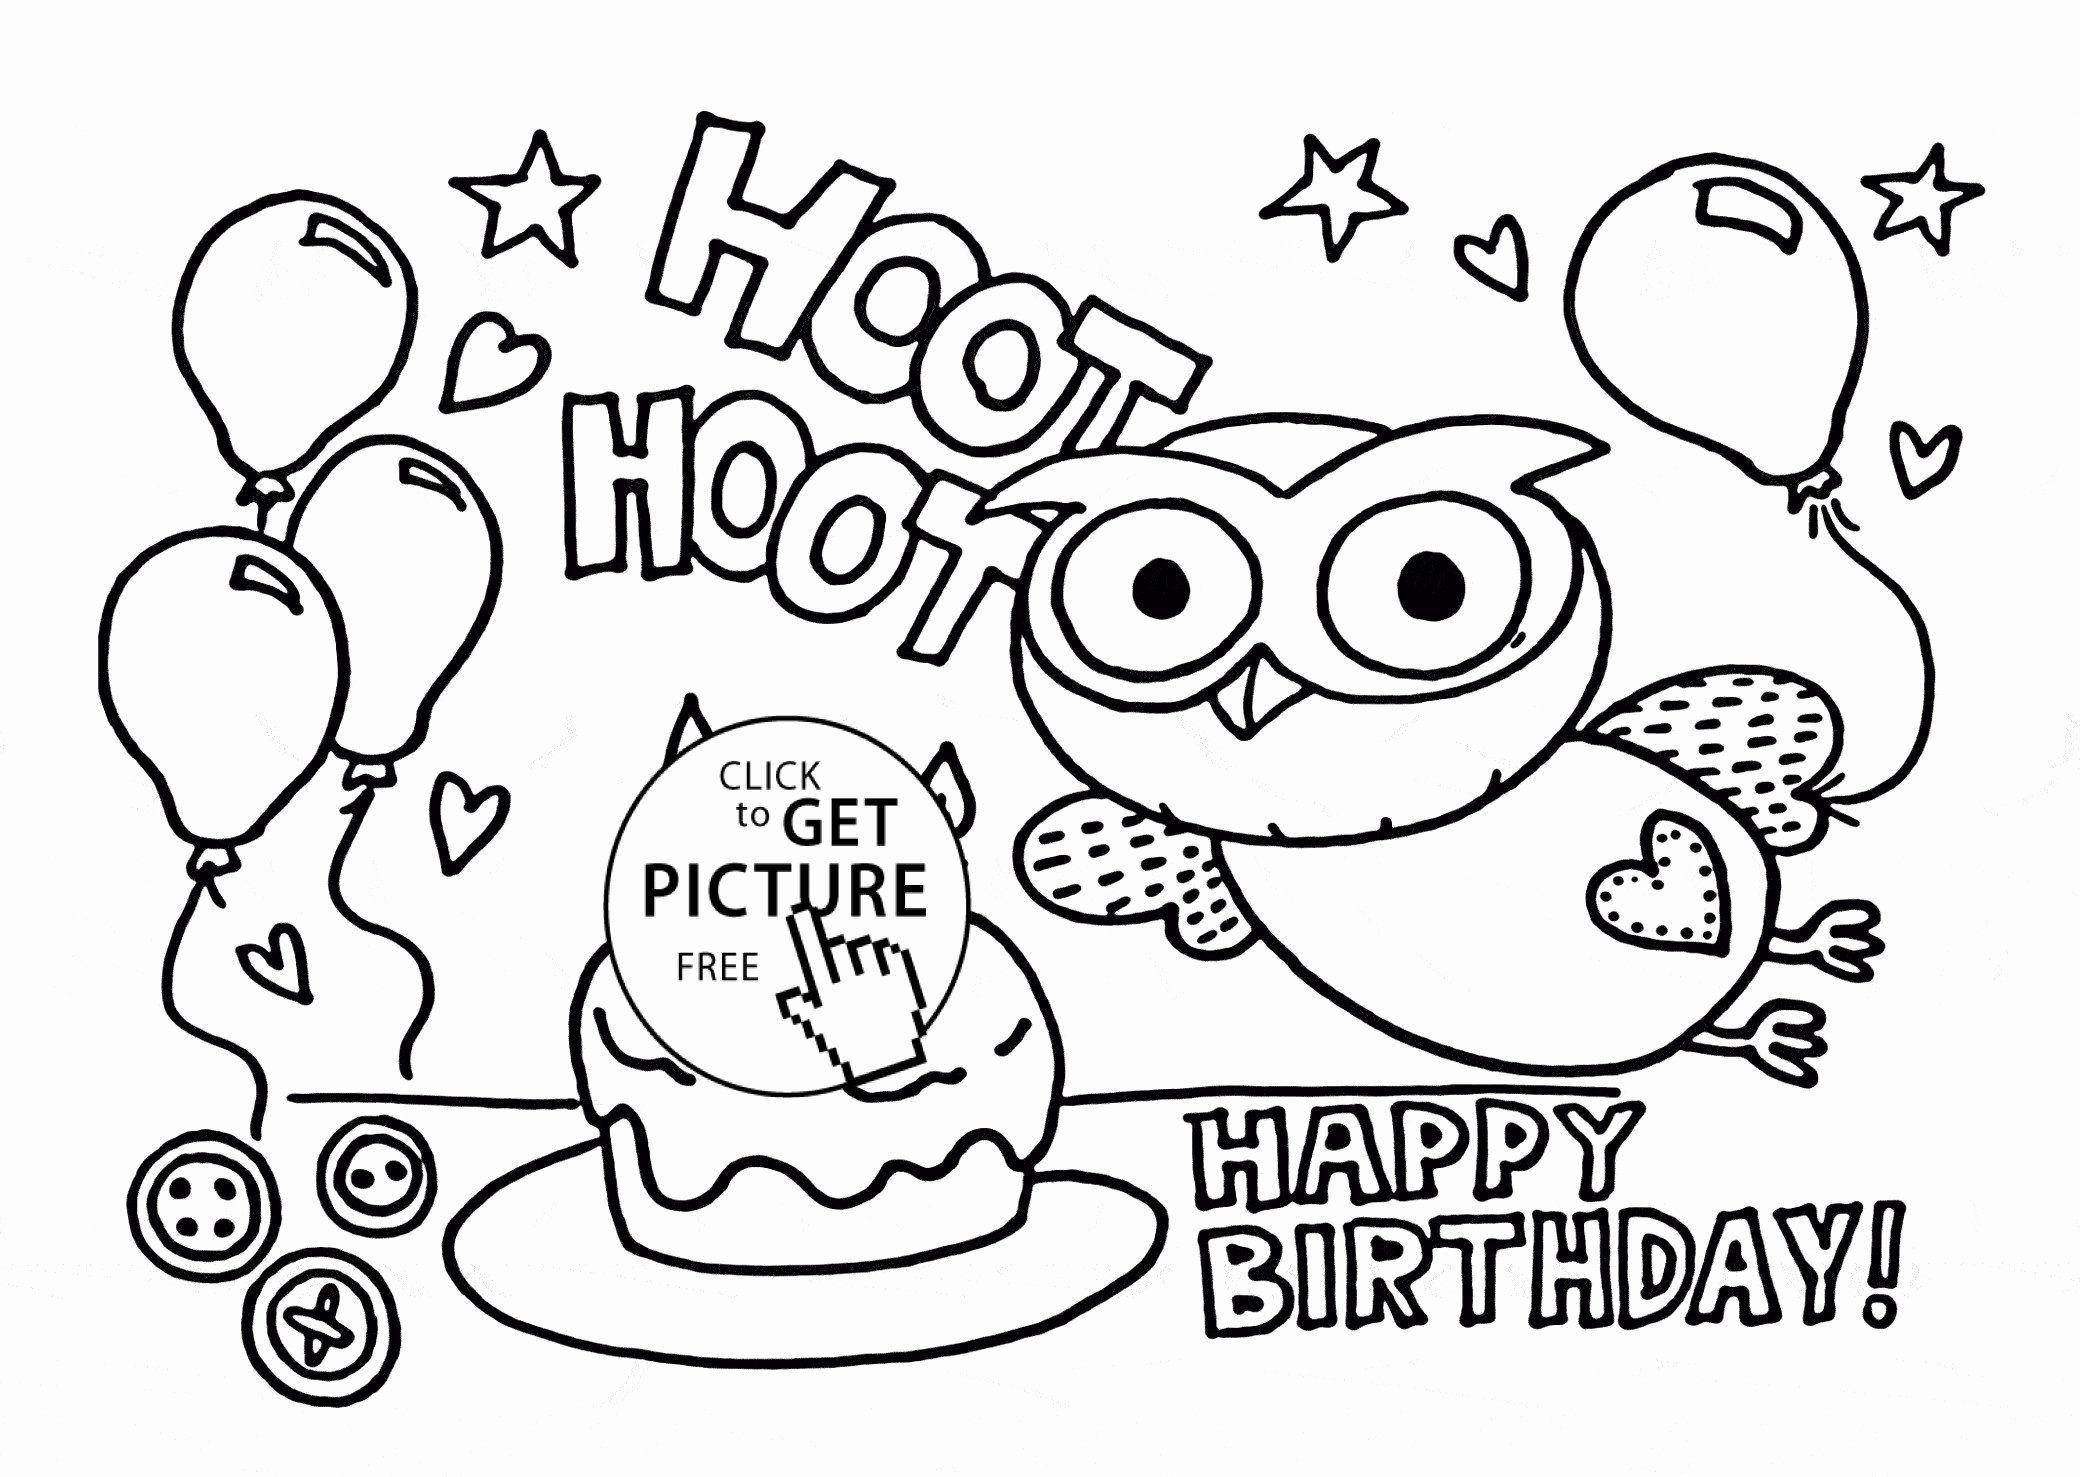 Coloring Pages For Your Boyfriend Unique Awesome Birthday Balloons Coloring Pages Trasporti Halaman Mewarnai Buku Mewarnai Kartu Selamat Ulang Tahun